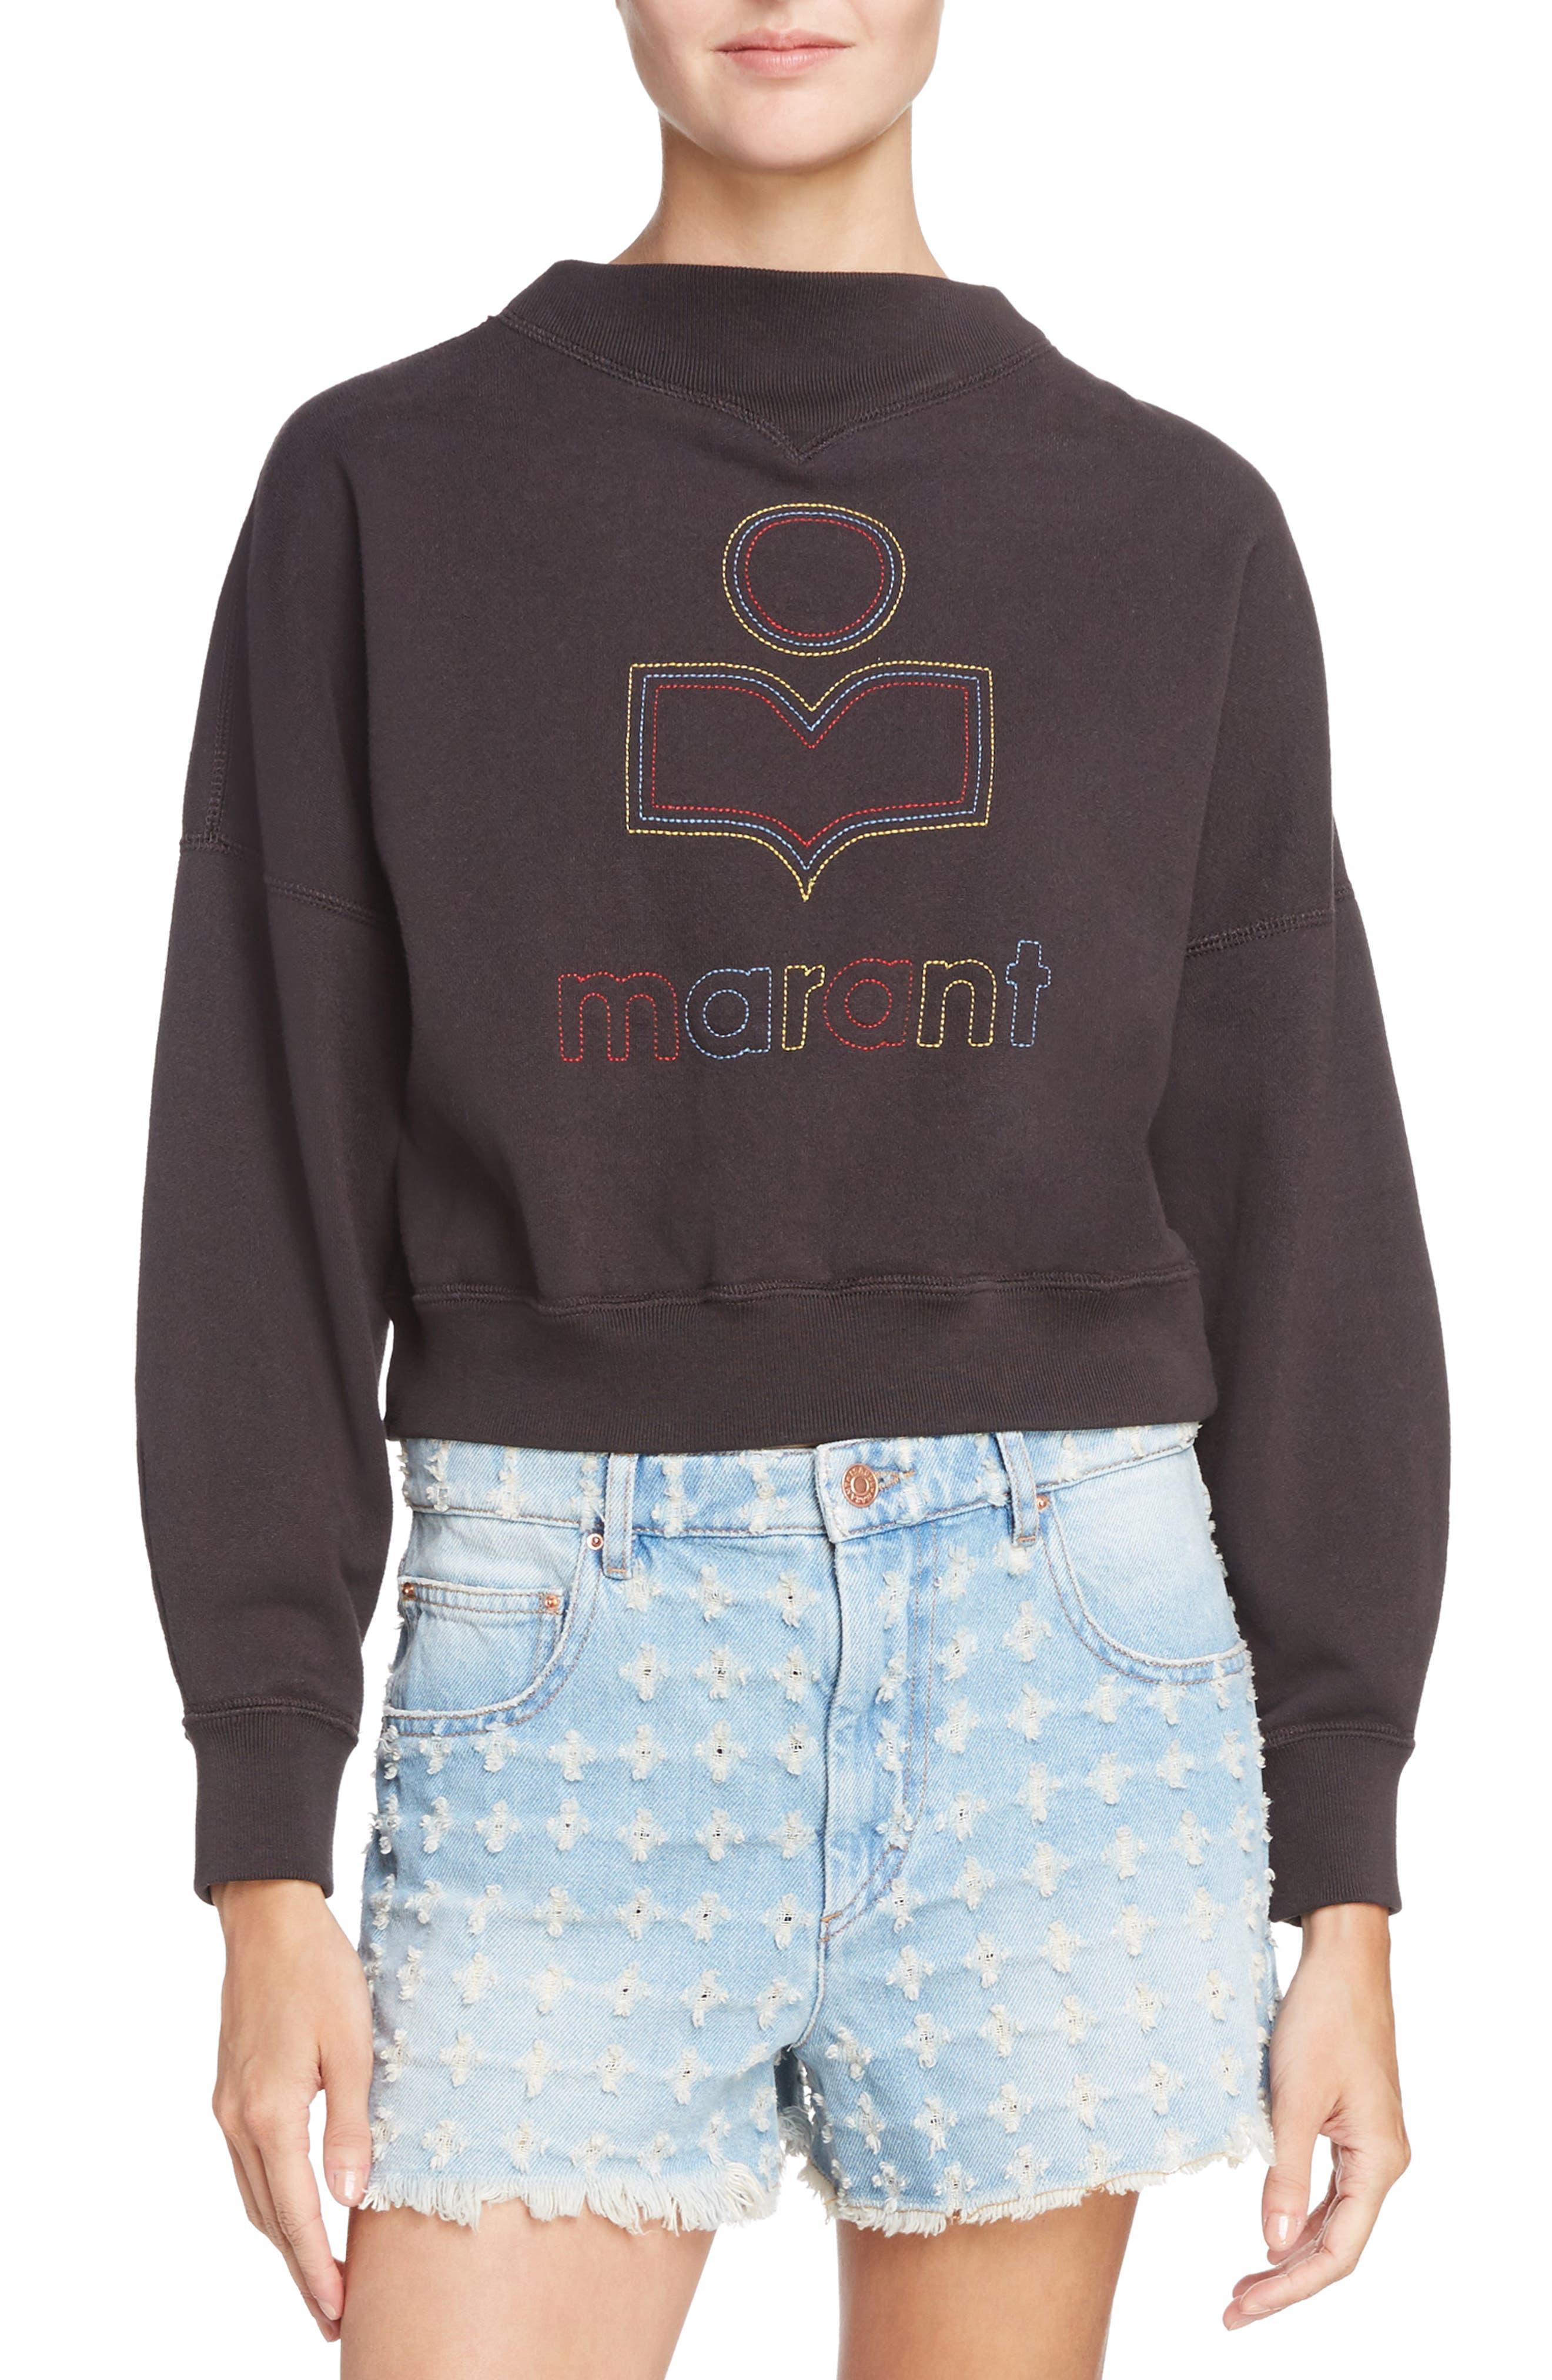 Odilon Sweatshirt,                         Main,                         color, 001